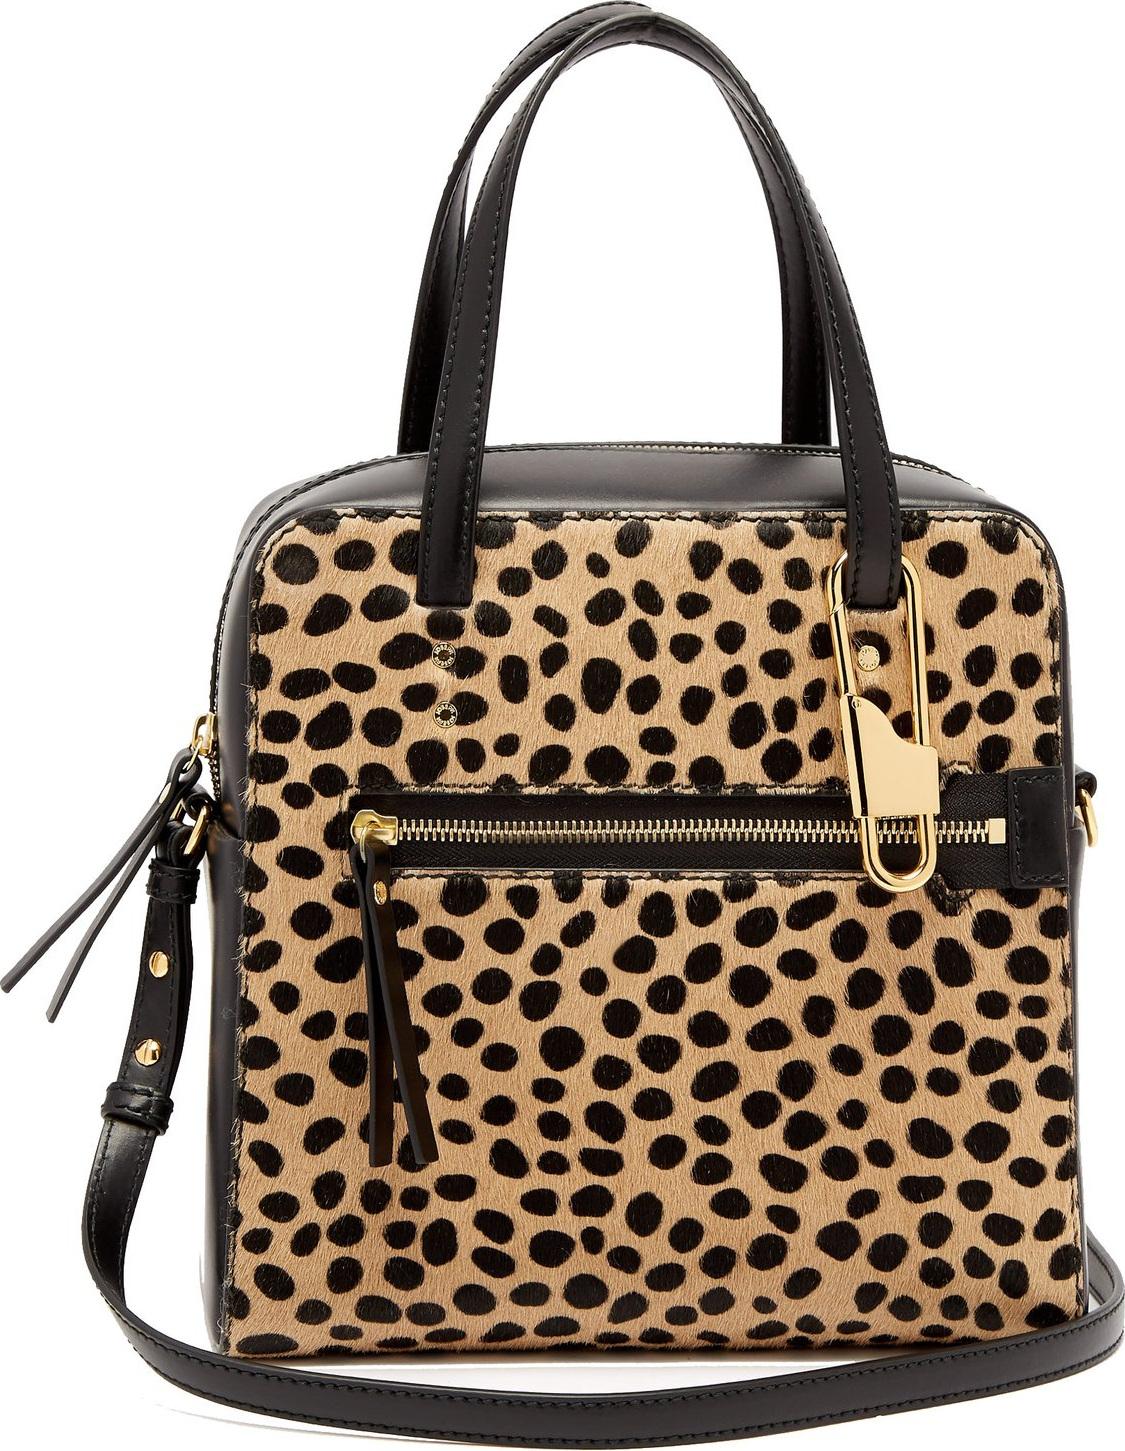 Joseph - Ryder 25 leopard-print pony-hair bag